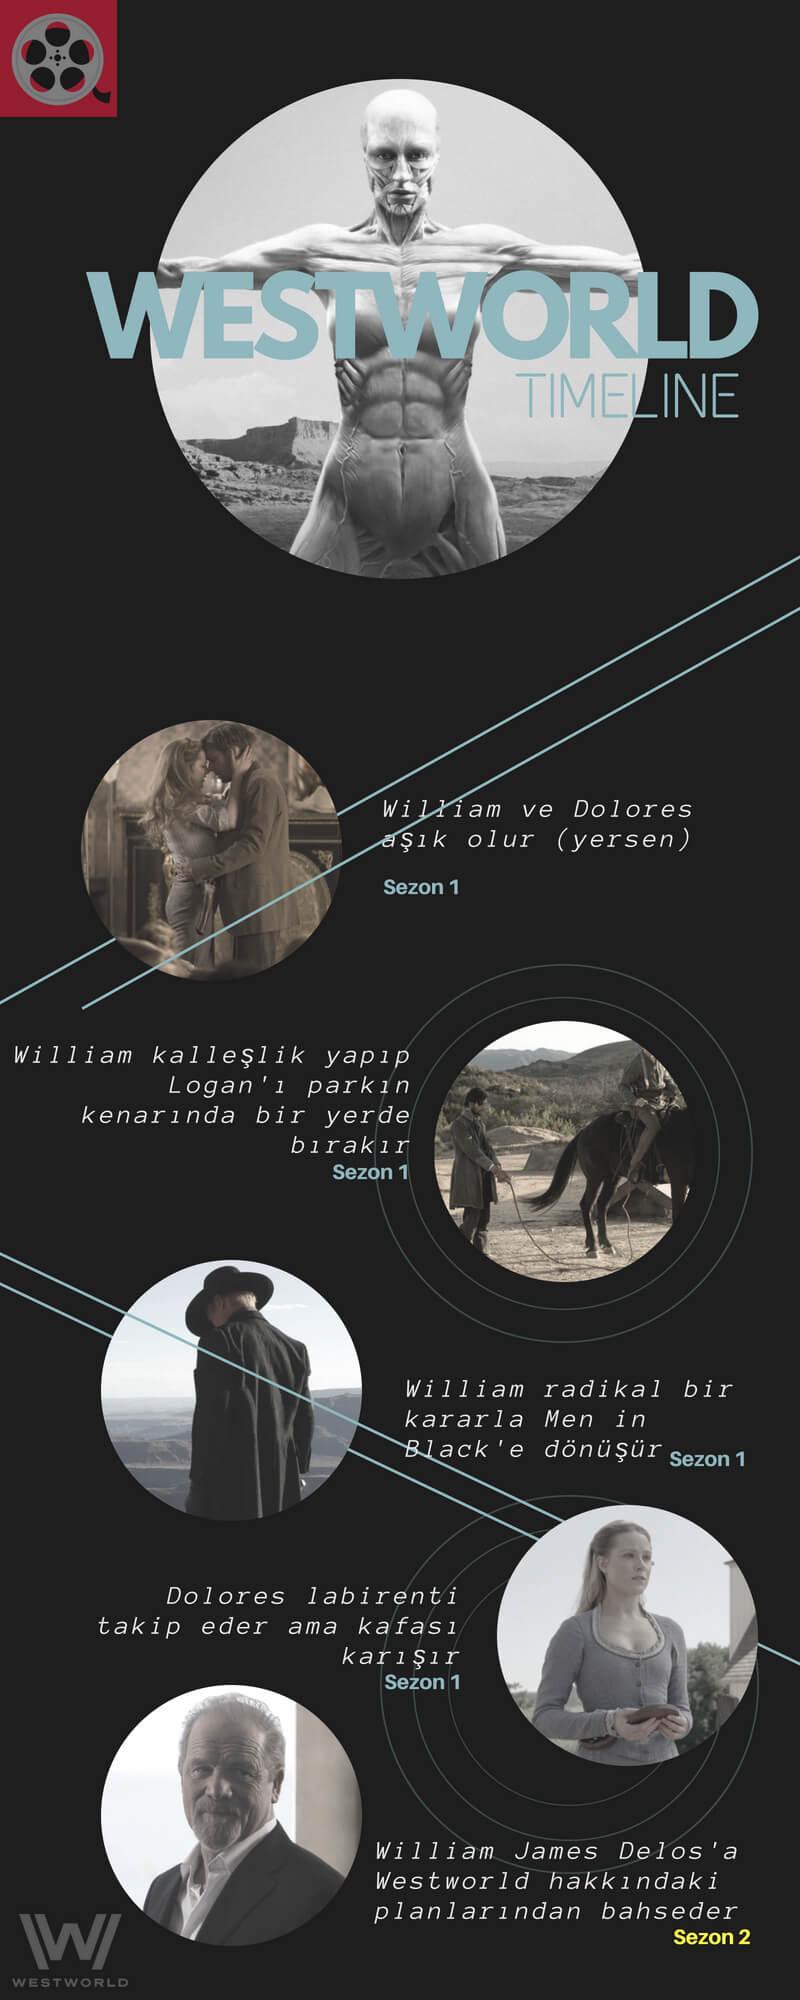 Westworld Timeline3